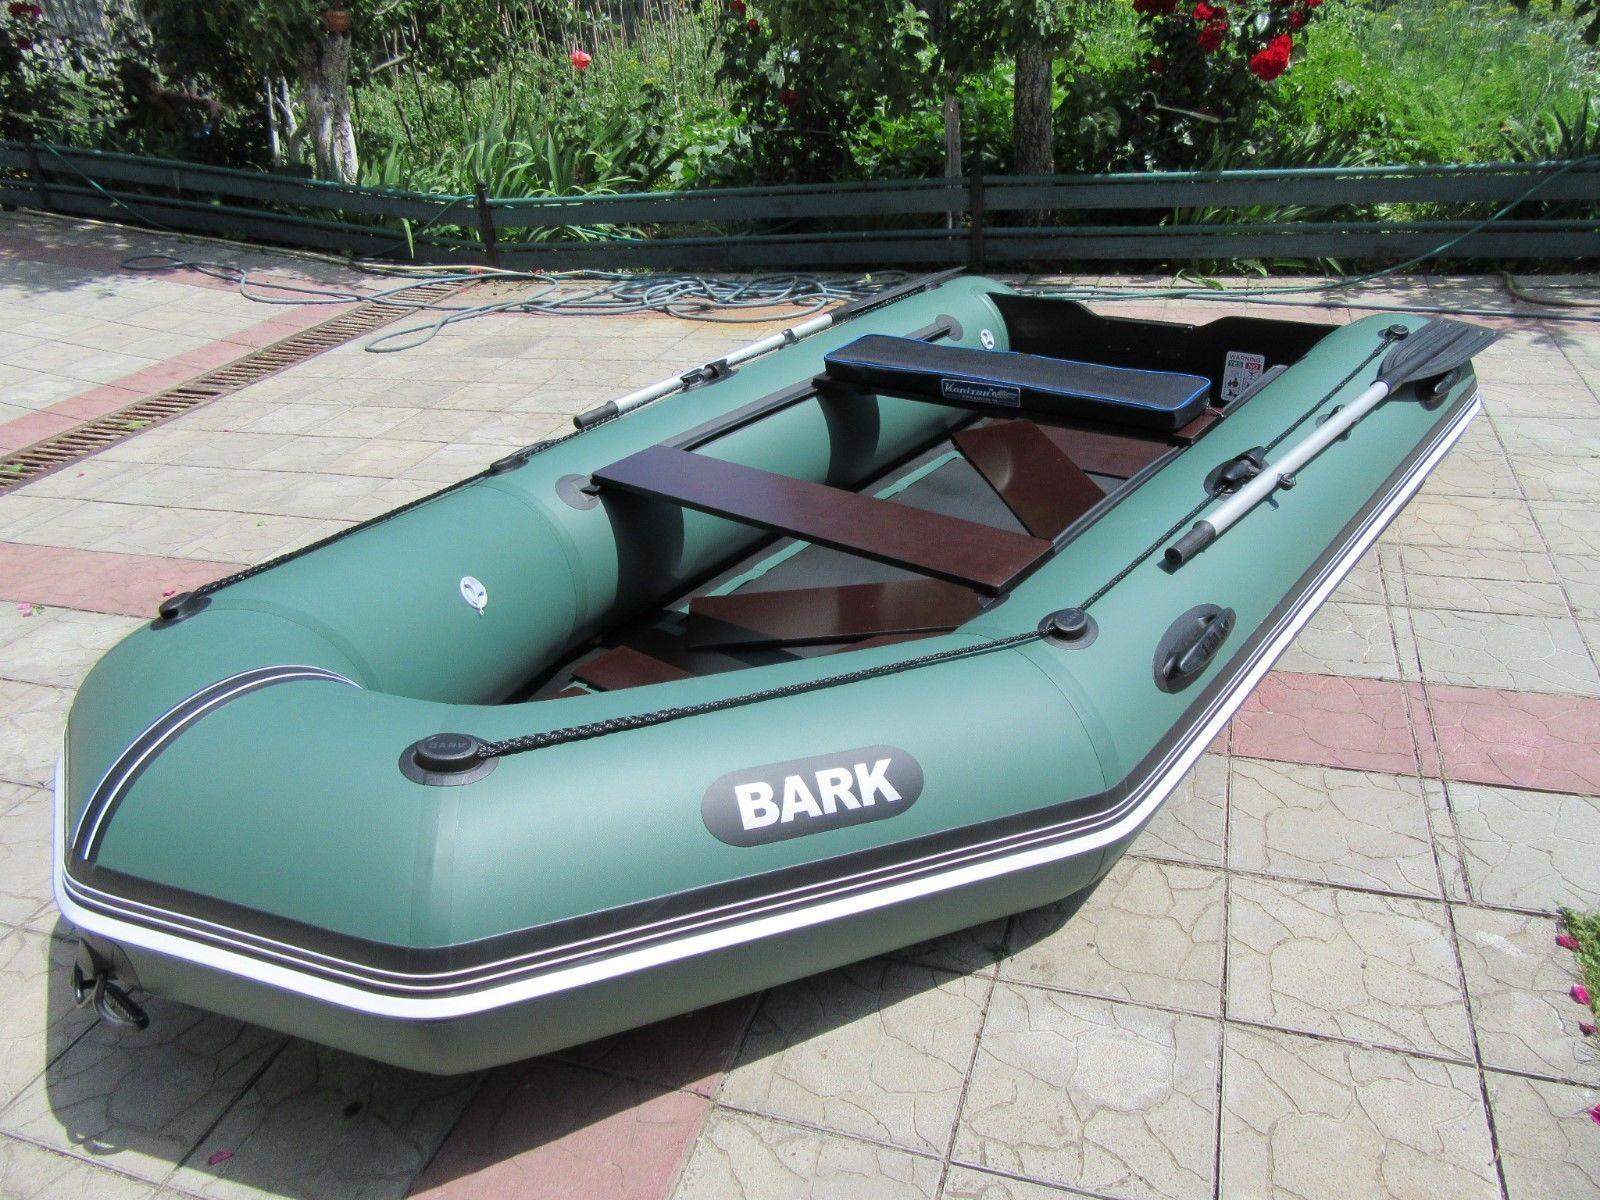 Brand NEW Inflatable Dinghy Boat BARK BT-310D 1